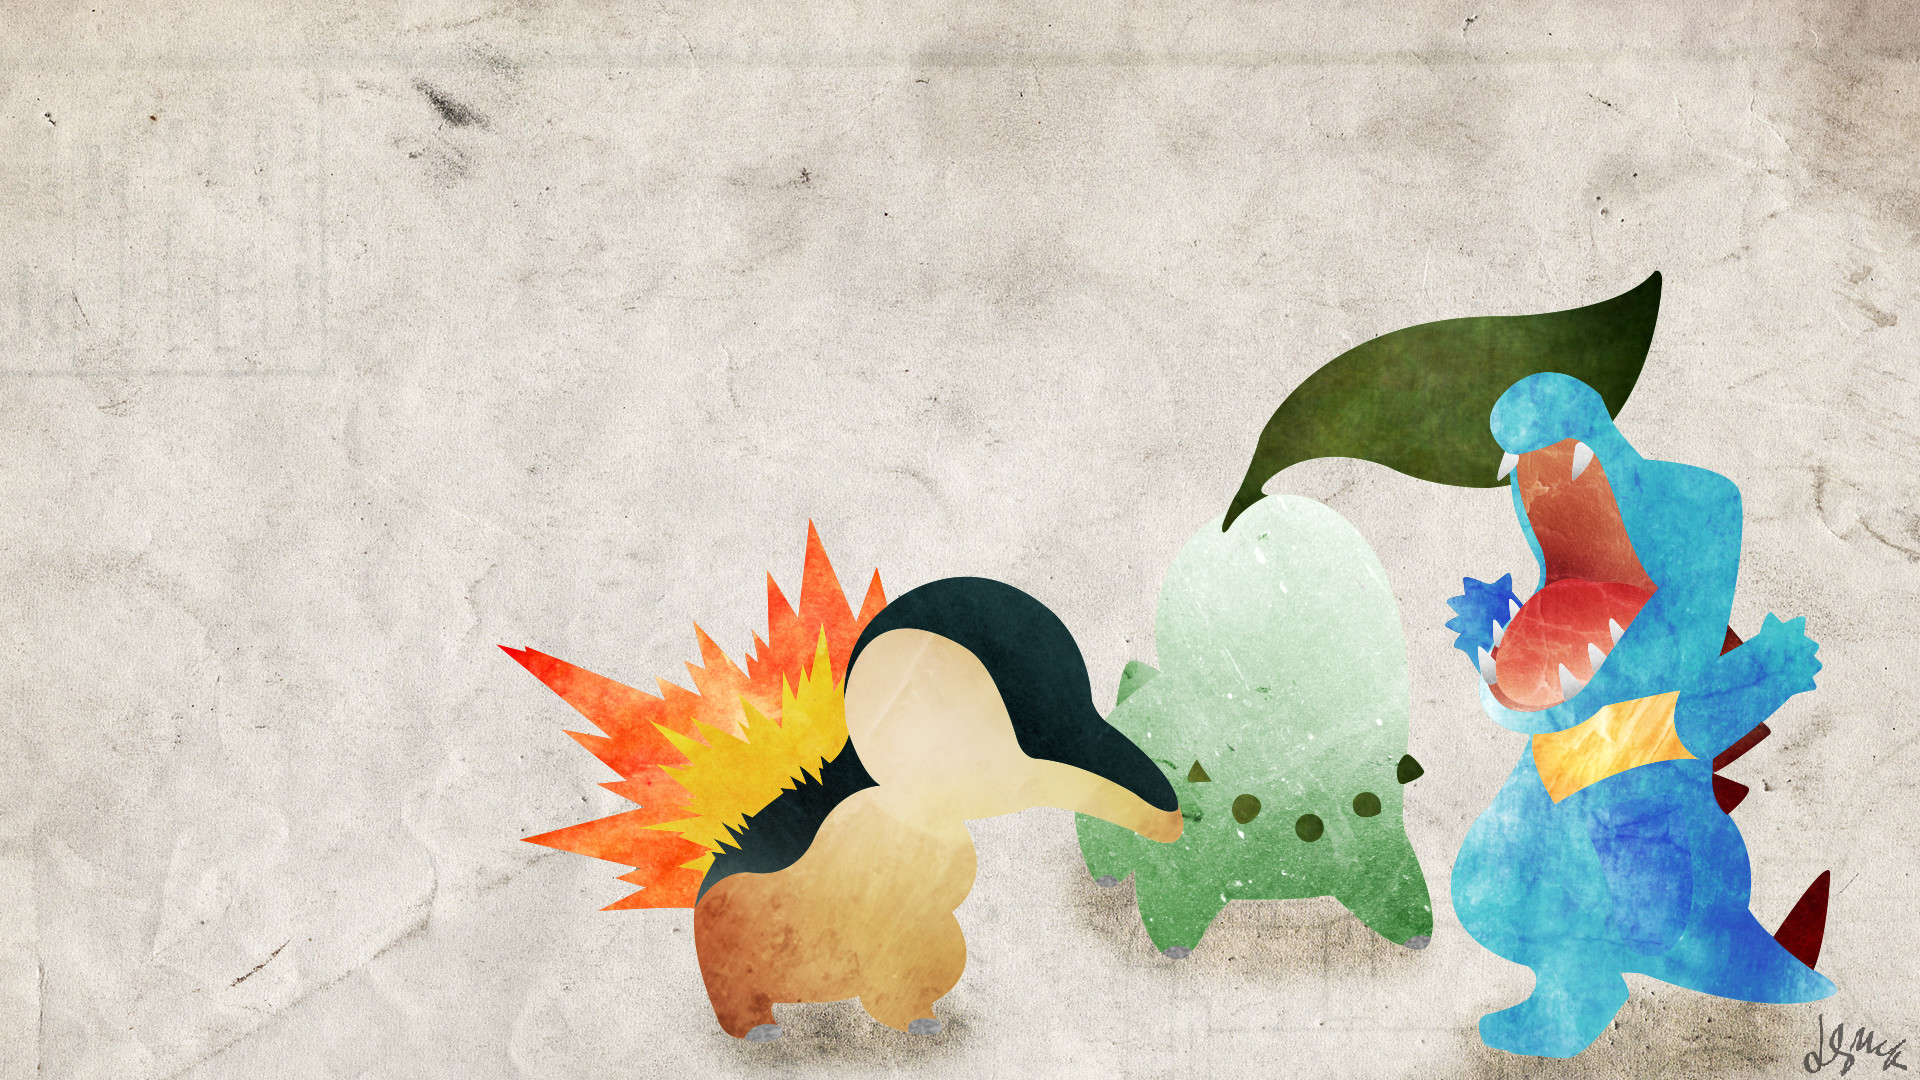 Johto Starters – Pokemon by doubleu42 Johto Starters – Pokemon by doubleu42